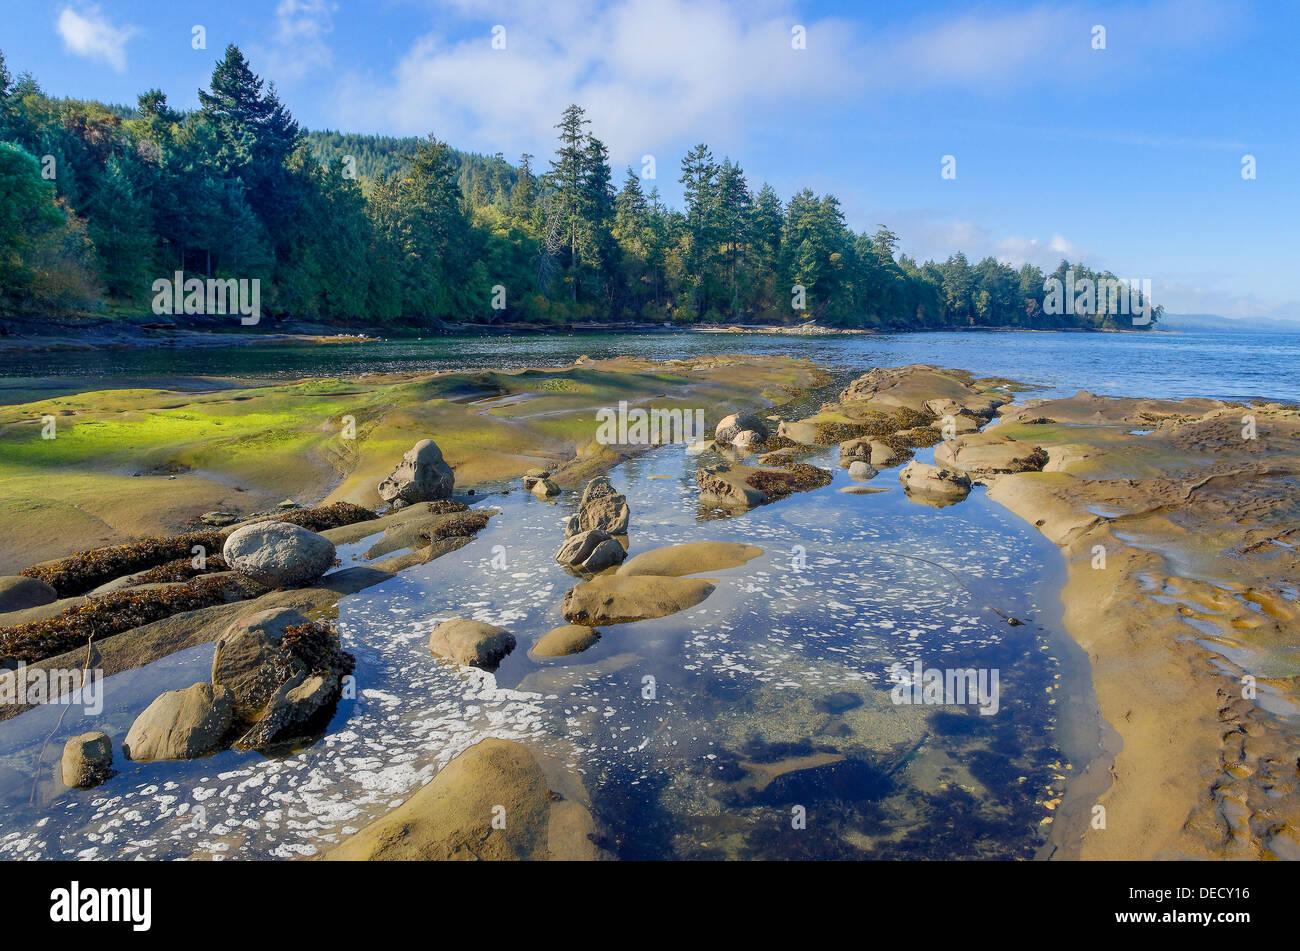 Rocks and tide pools, Cable Bay, Galiano Island, British Columbia, Canada - Stock Image